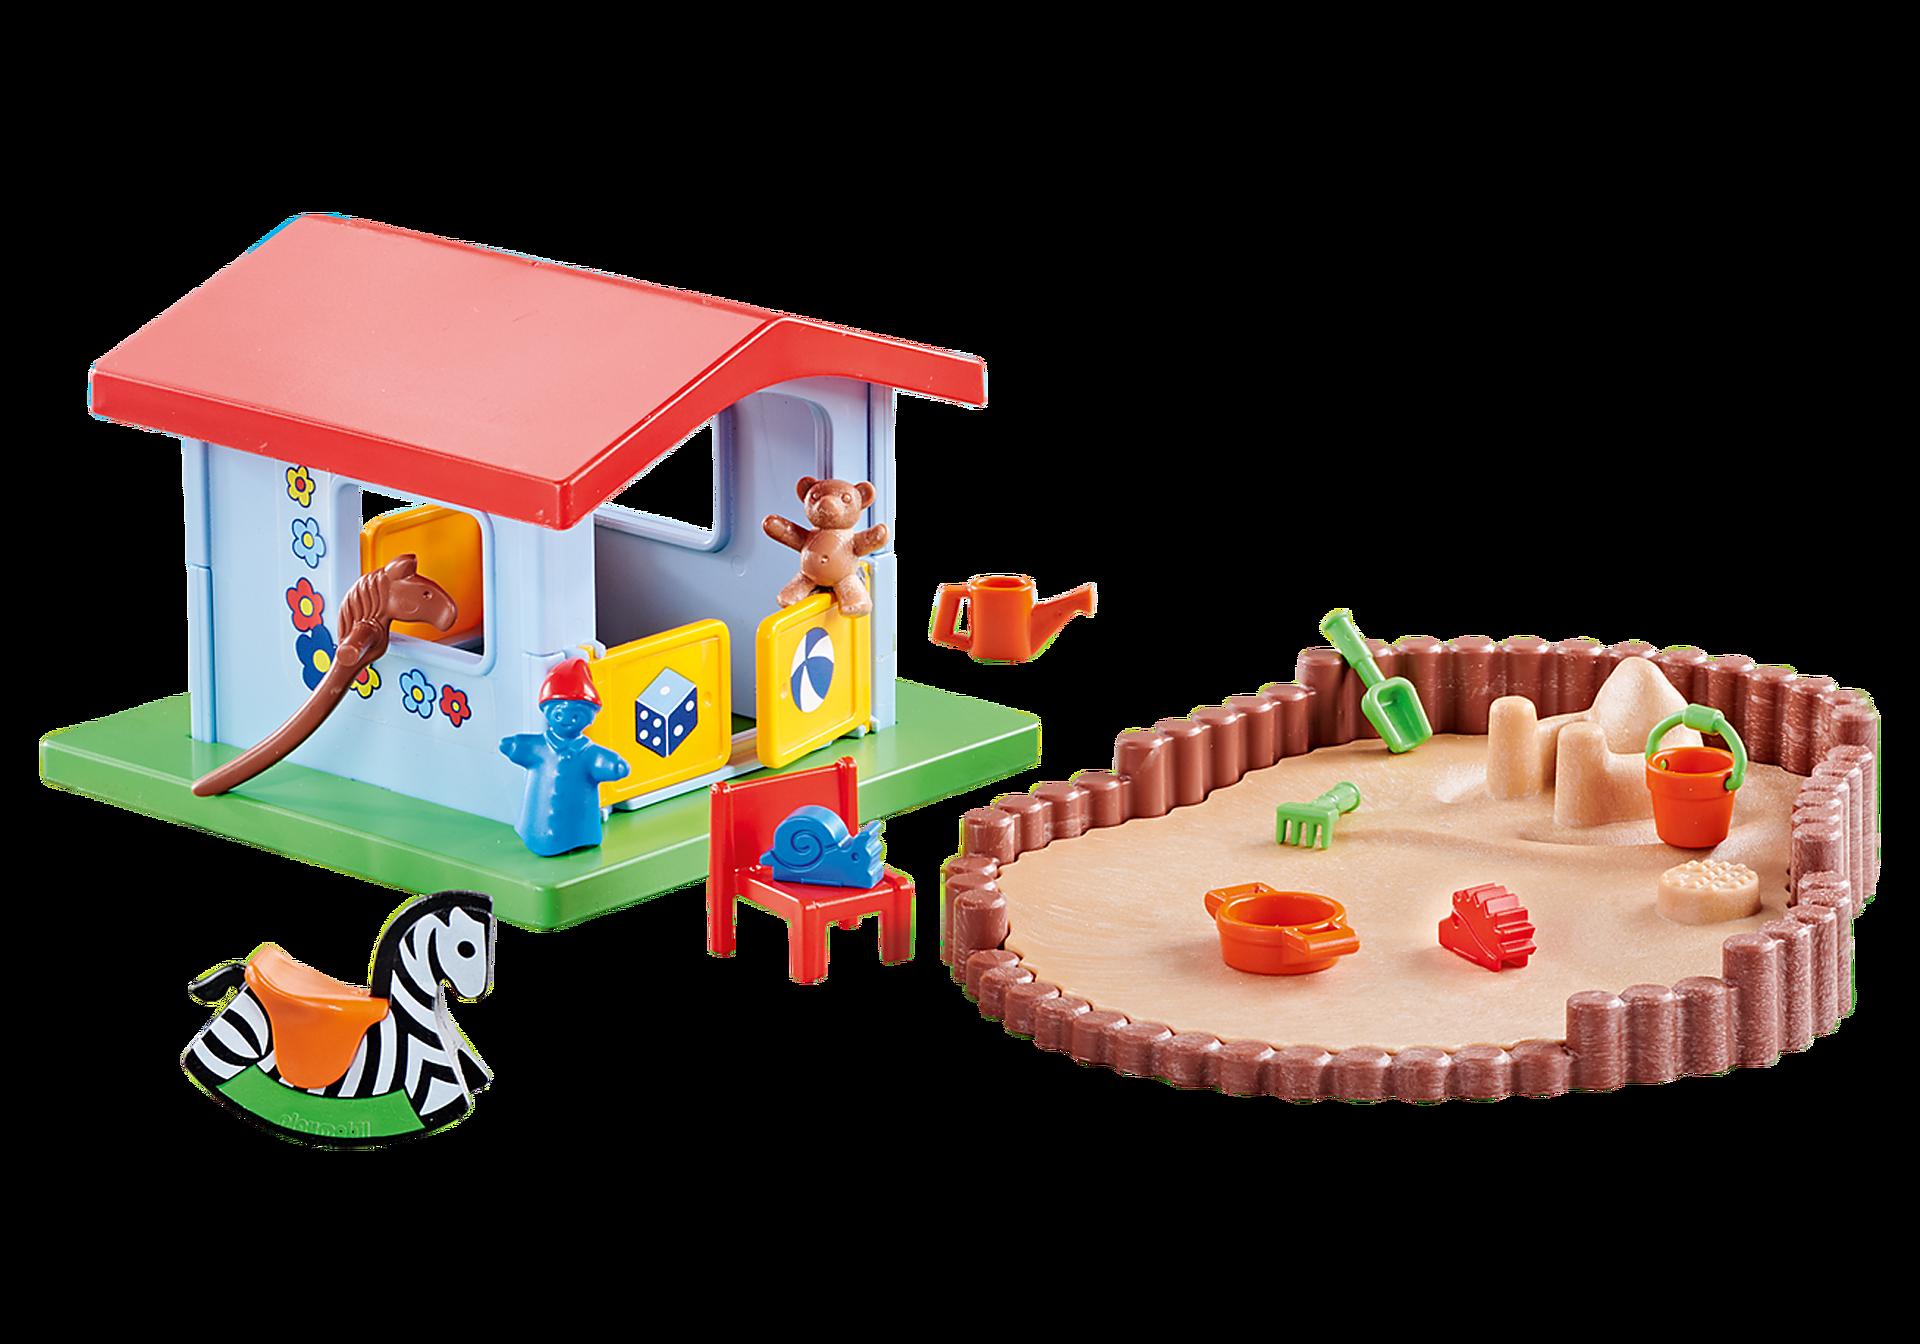 http://media.playmobil.com/i/playmobil/9814_product_detail/Cabane de jeu et bac à sable